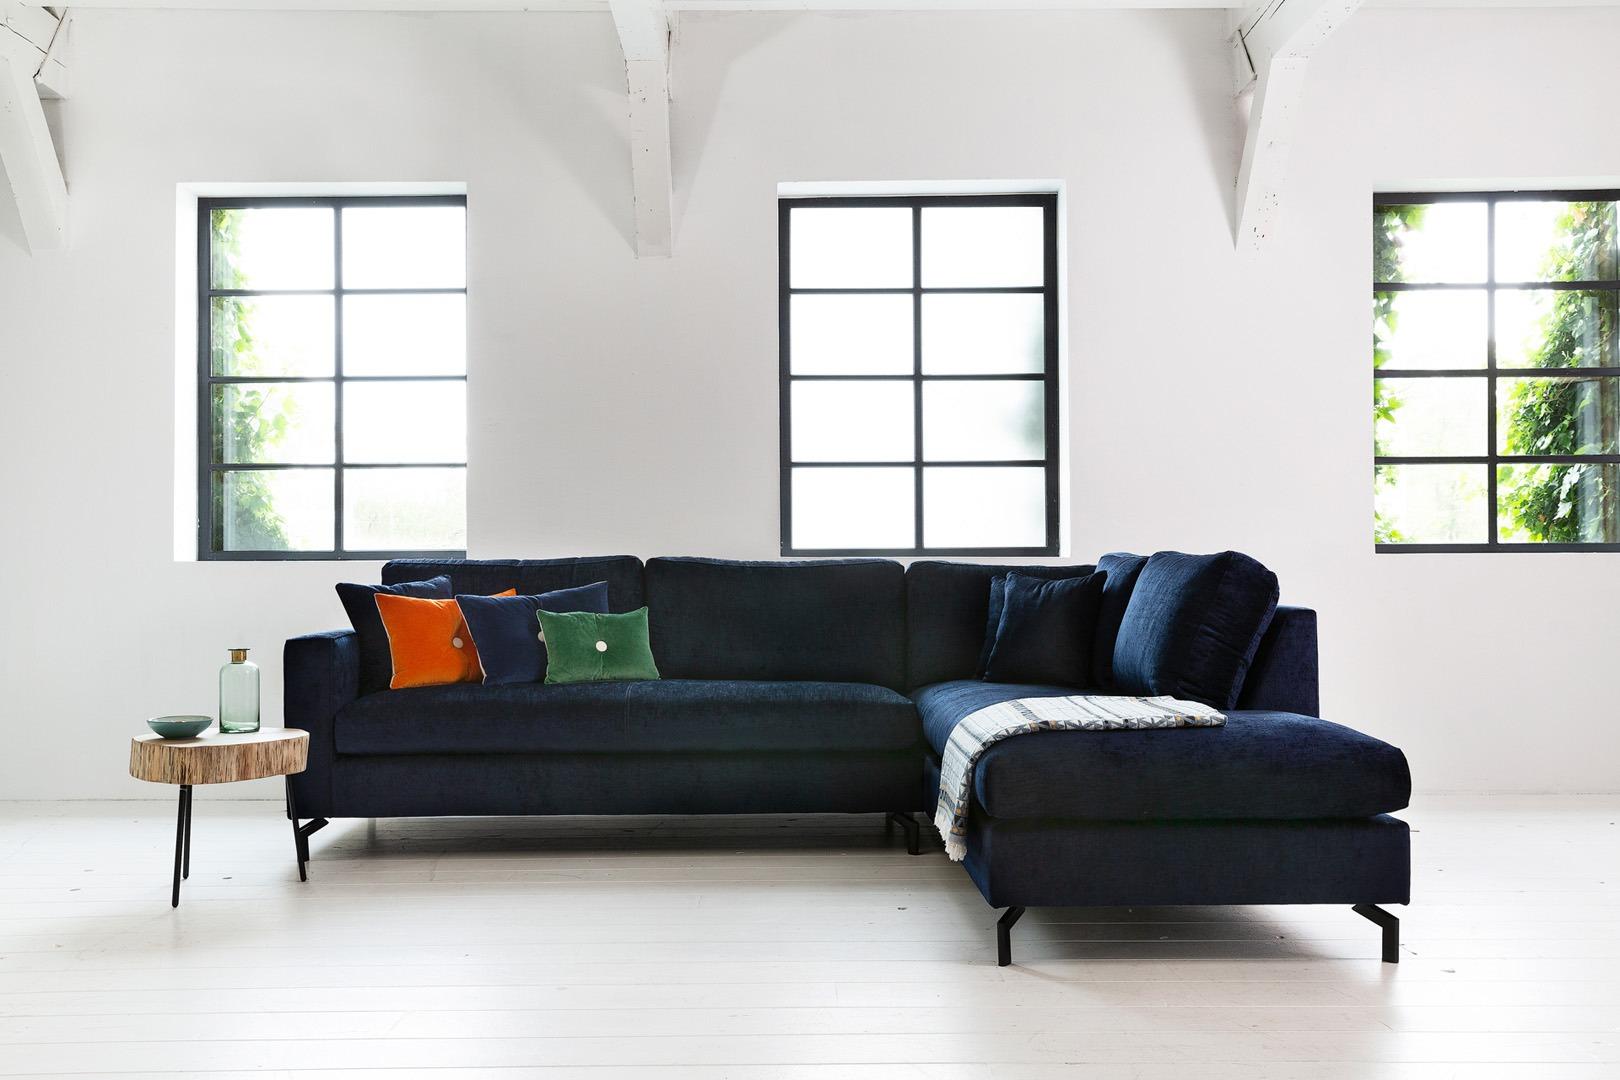 Romantic-paris-hoekbank-met-longchair-bauw-stof-soofs-interieur